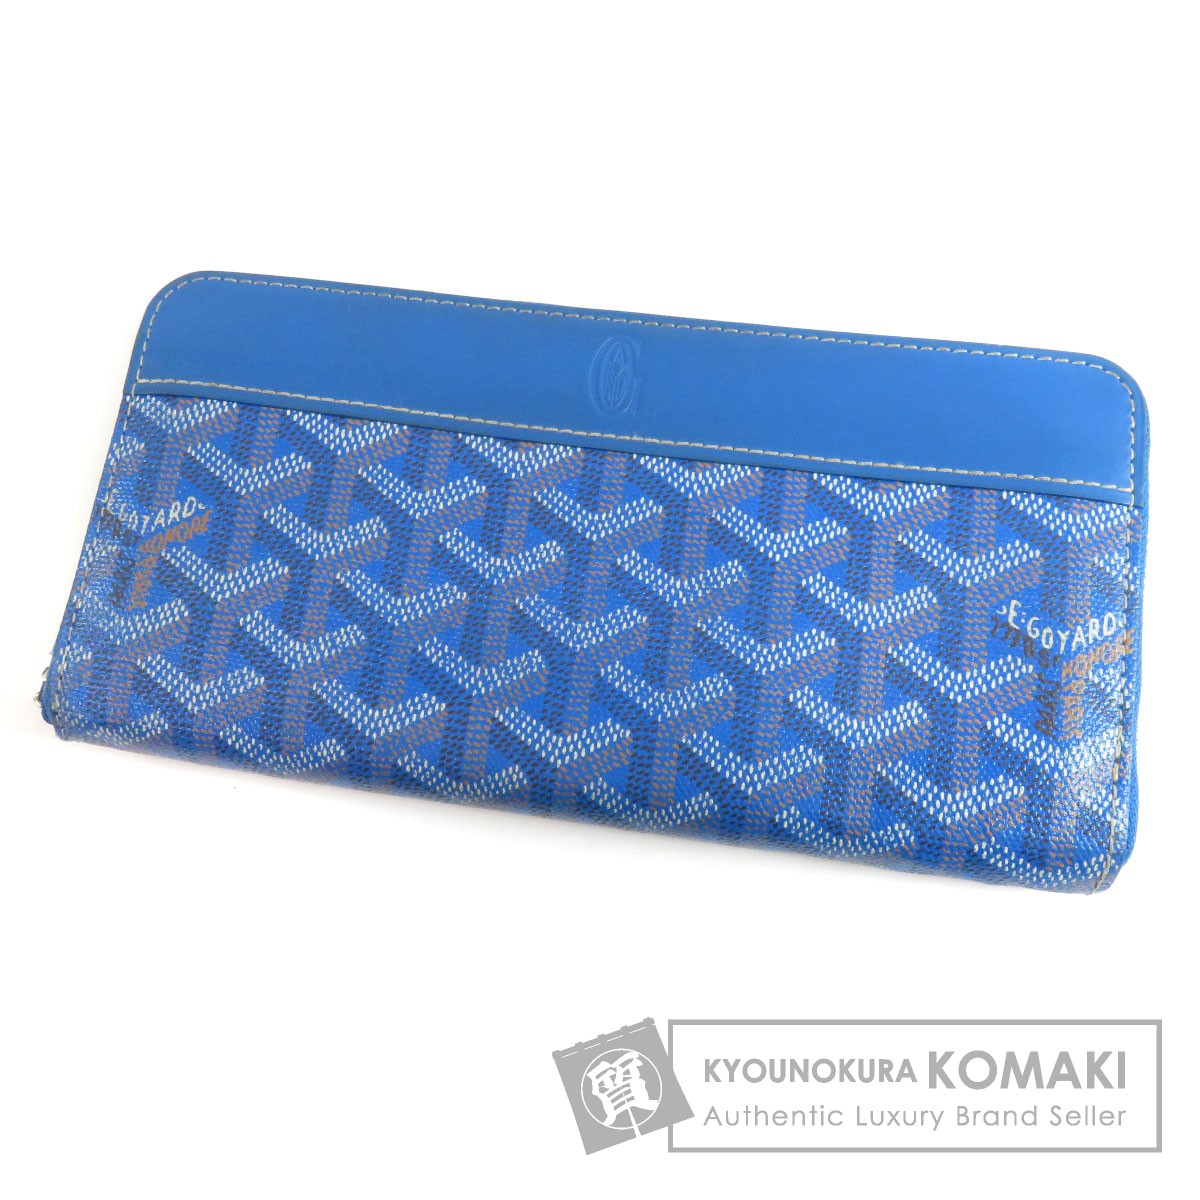 GOYARD ラウンドファスナー 長財布(小銭入れあり) PVC/レザー レディース 【中古】【ゴヤール】